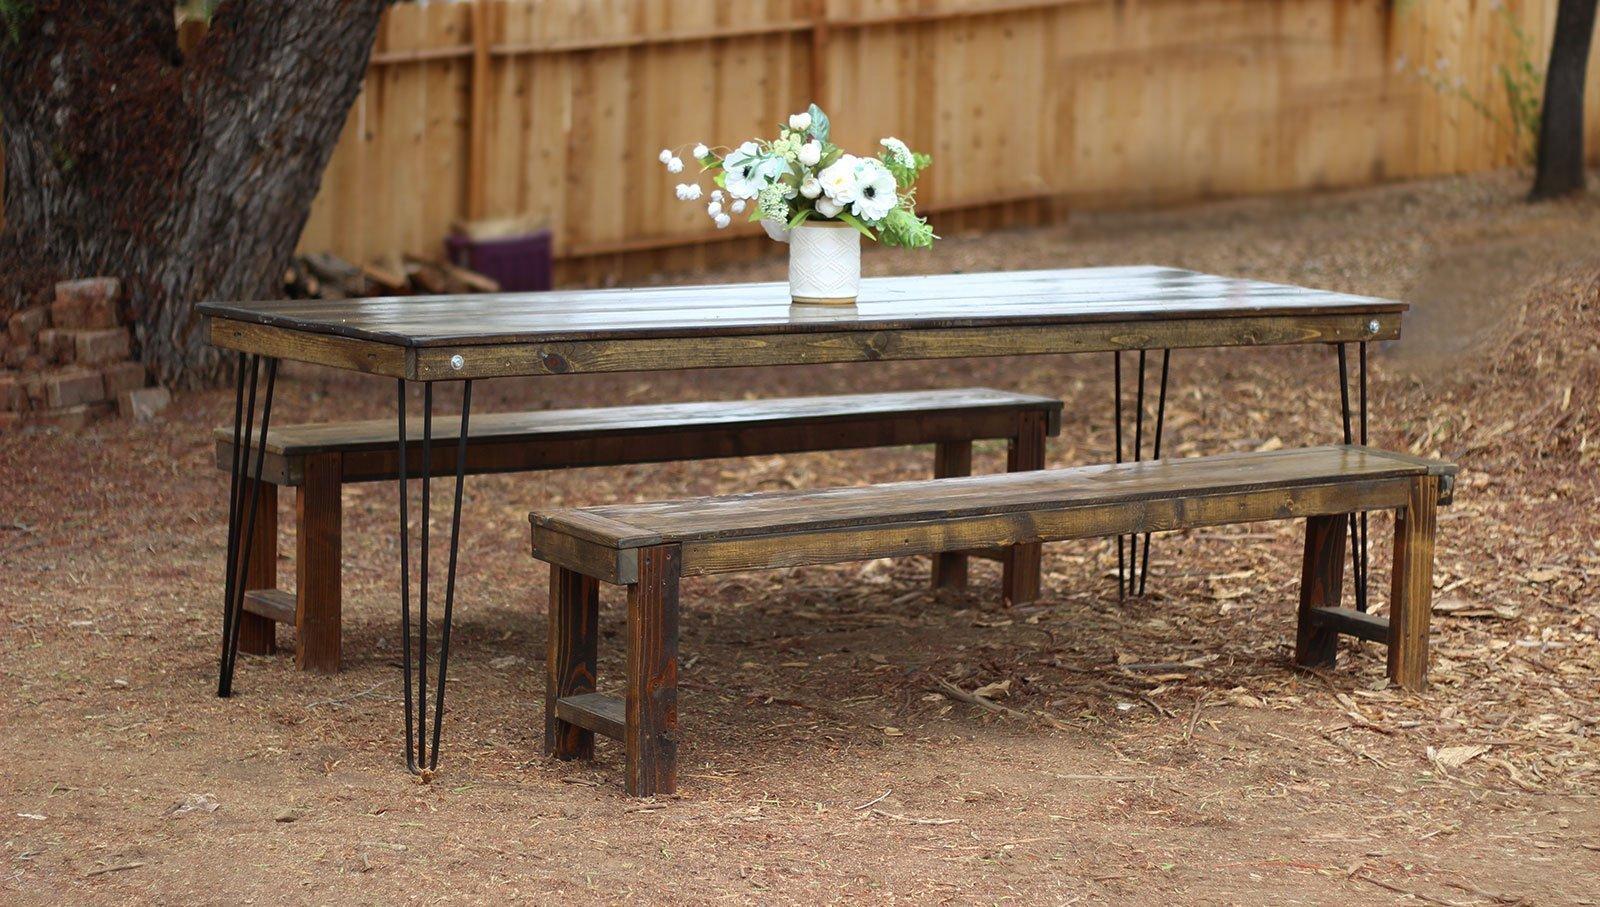 tables chairs rental 2 office chair z gallerie hairpin leg farm table rentals san diego modern wood